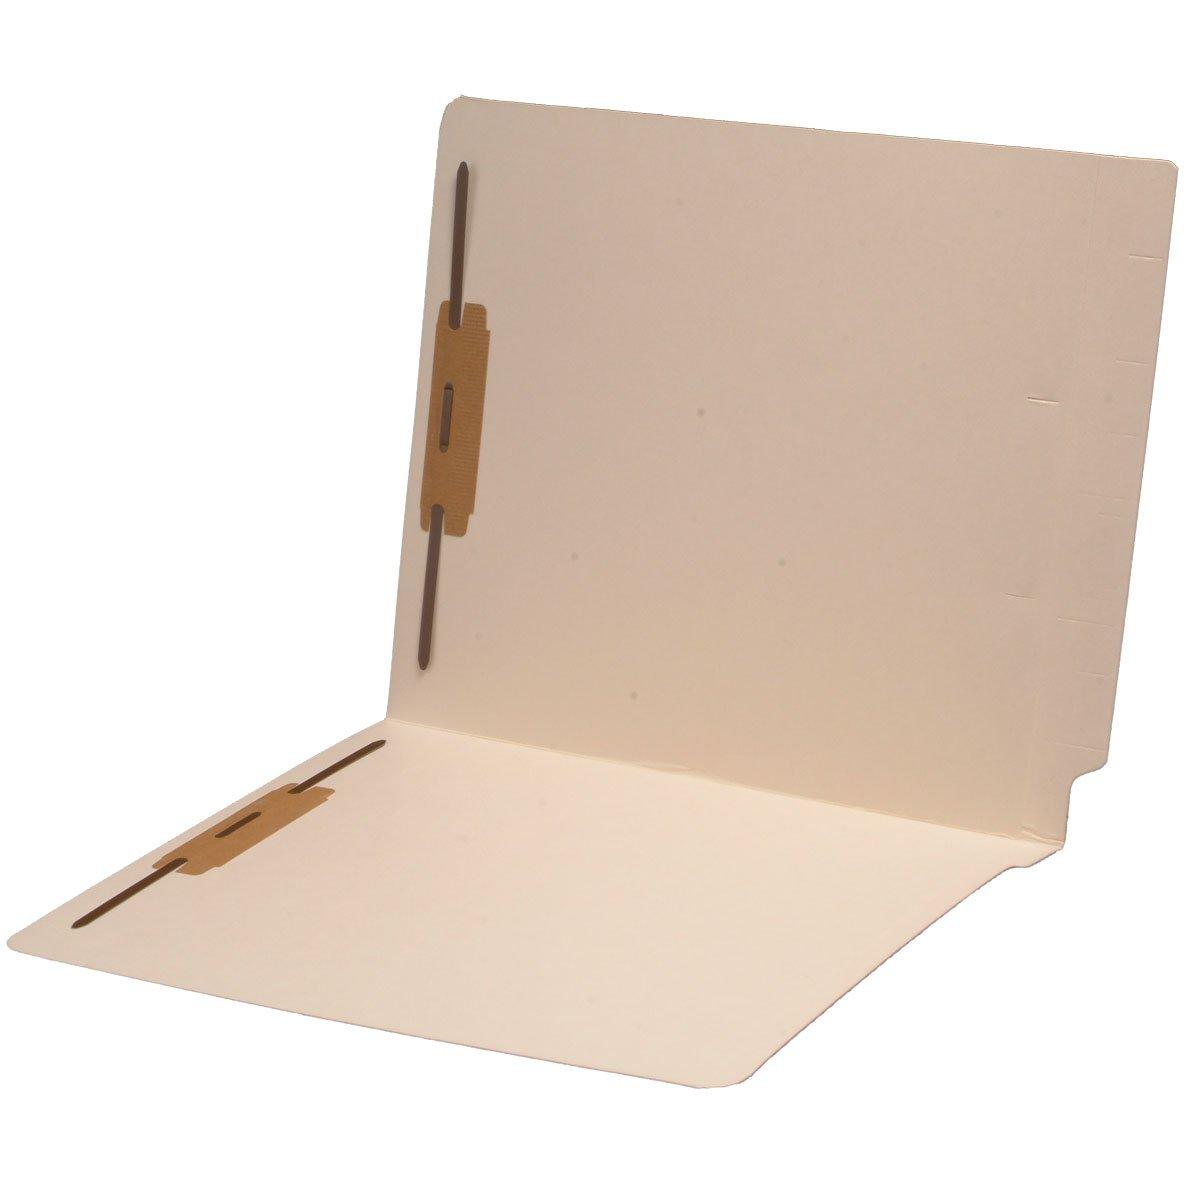 11 pt Manila Folders, Full Cut 2-Ply End Tab, Letter Size, Fastener Pos #1 & #3 (Carton of 250) by Ecom Folders